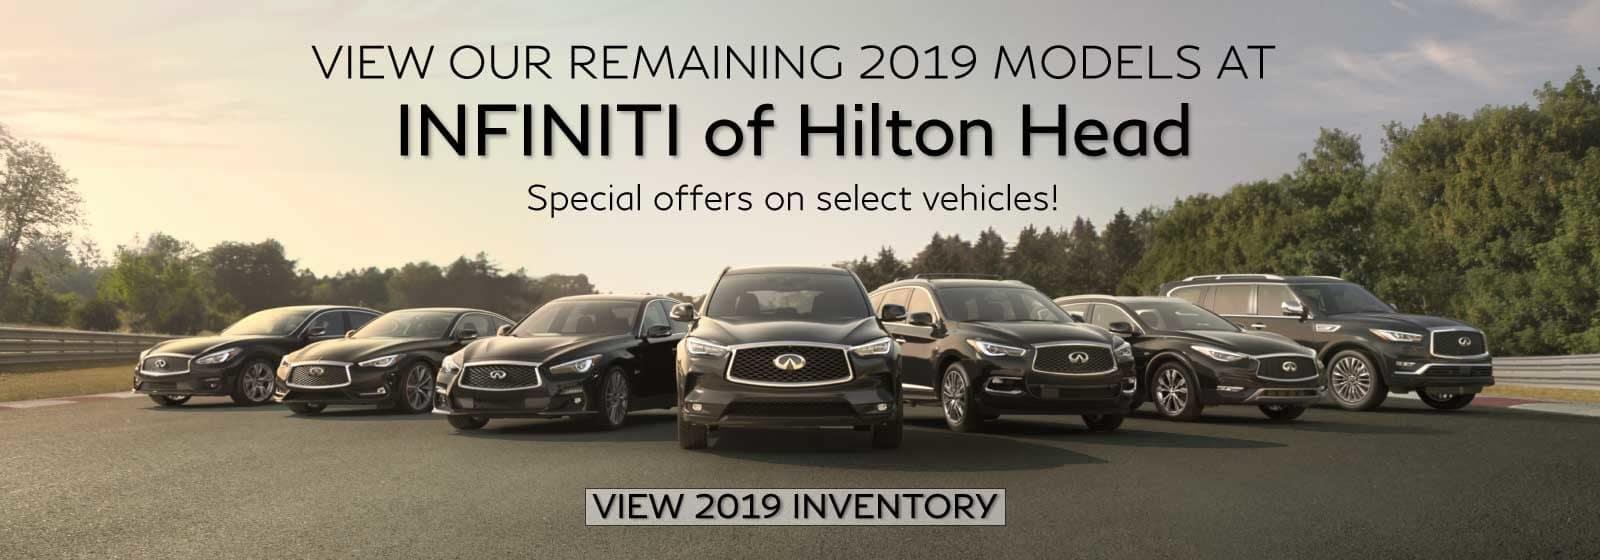 2019 Vehicles remaining at INFINITI of Hilton Head